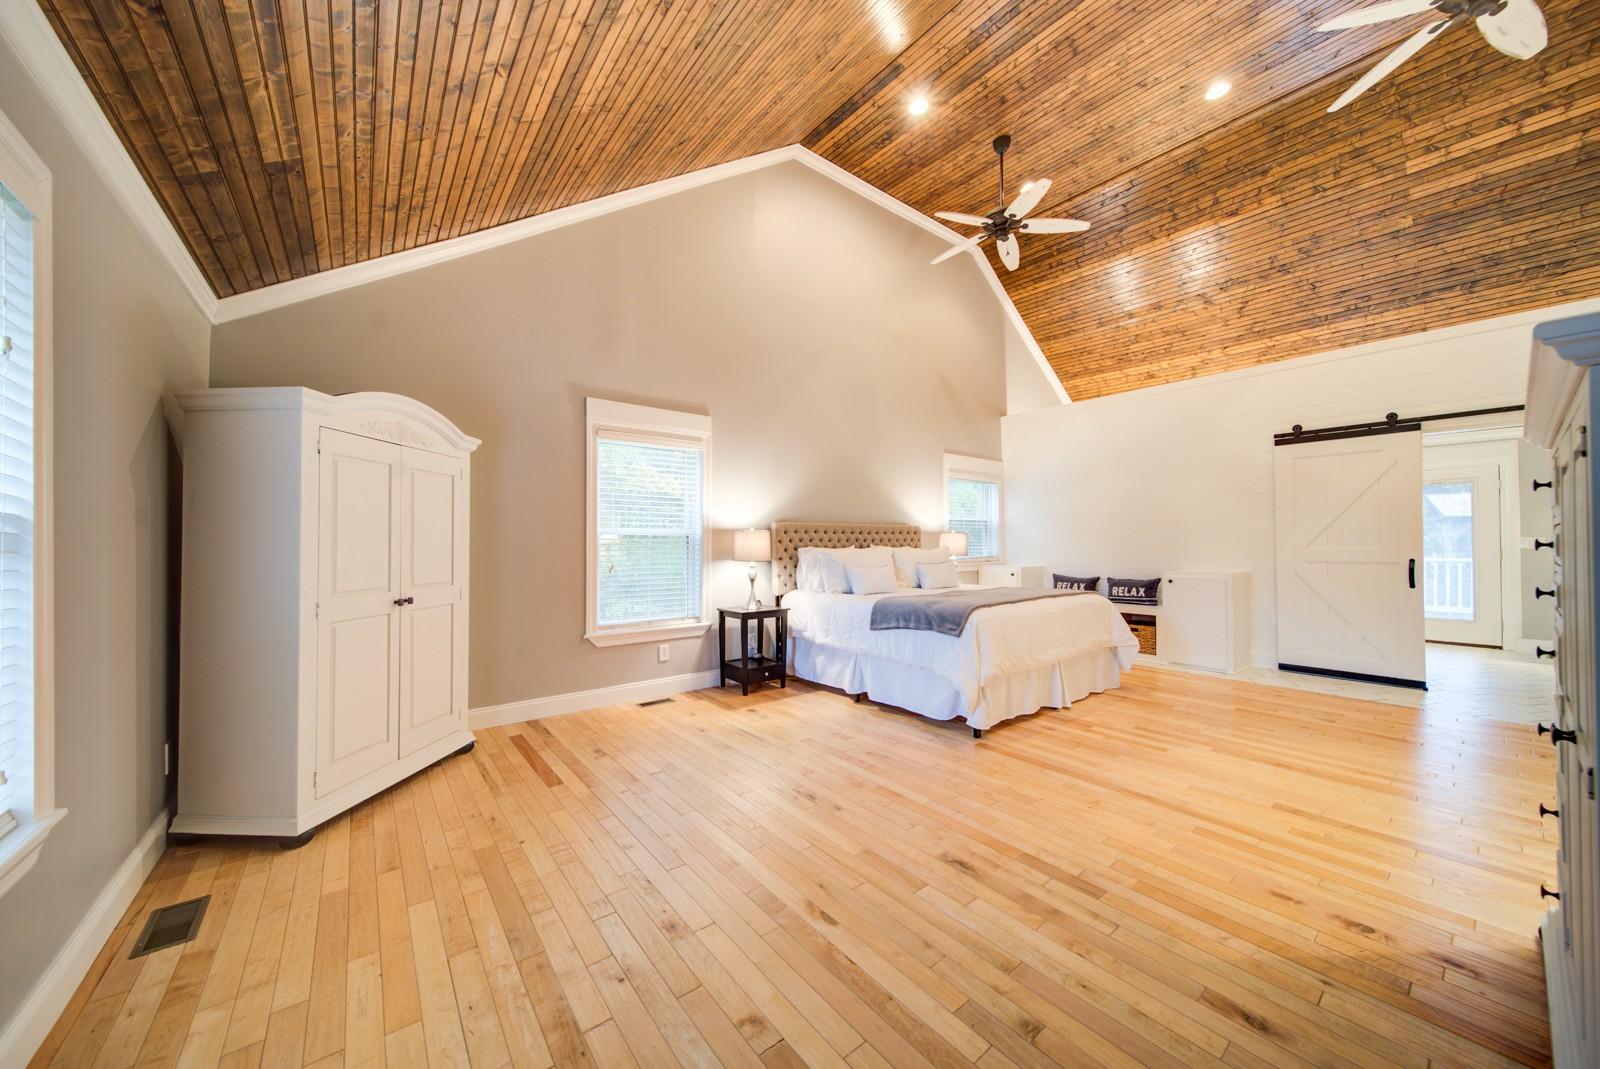 9788 Concord Rd, Rockvale, TN 37153 - Rockvale, TN real estate listing